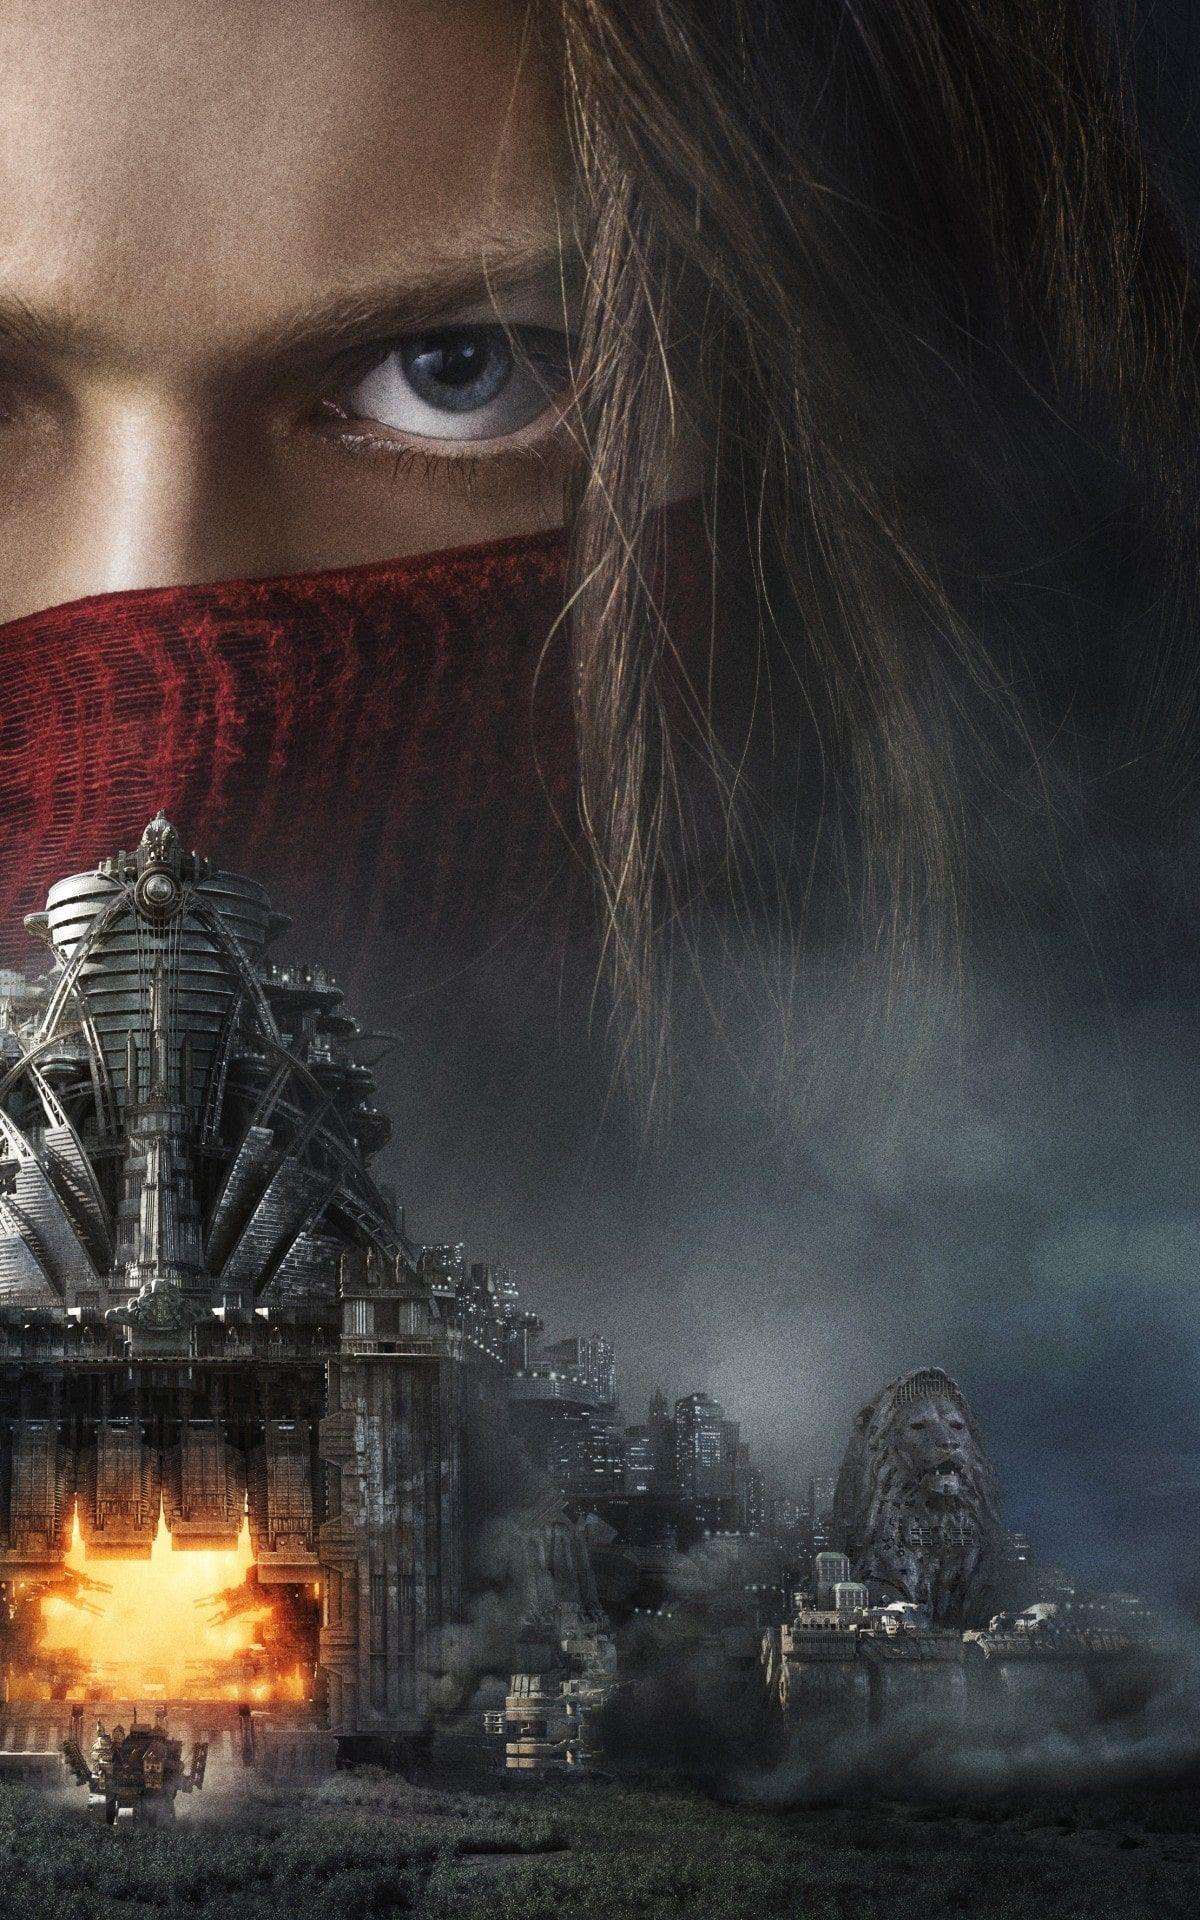 Mortal Engines Hd Wallpapers 7wallpapers Net Mortal Engines Full Movies Online Free Free Movies Online